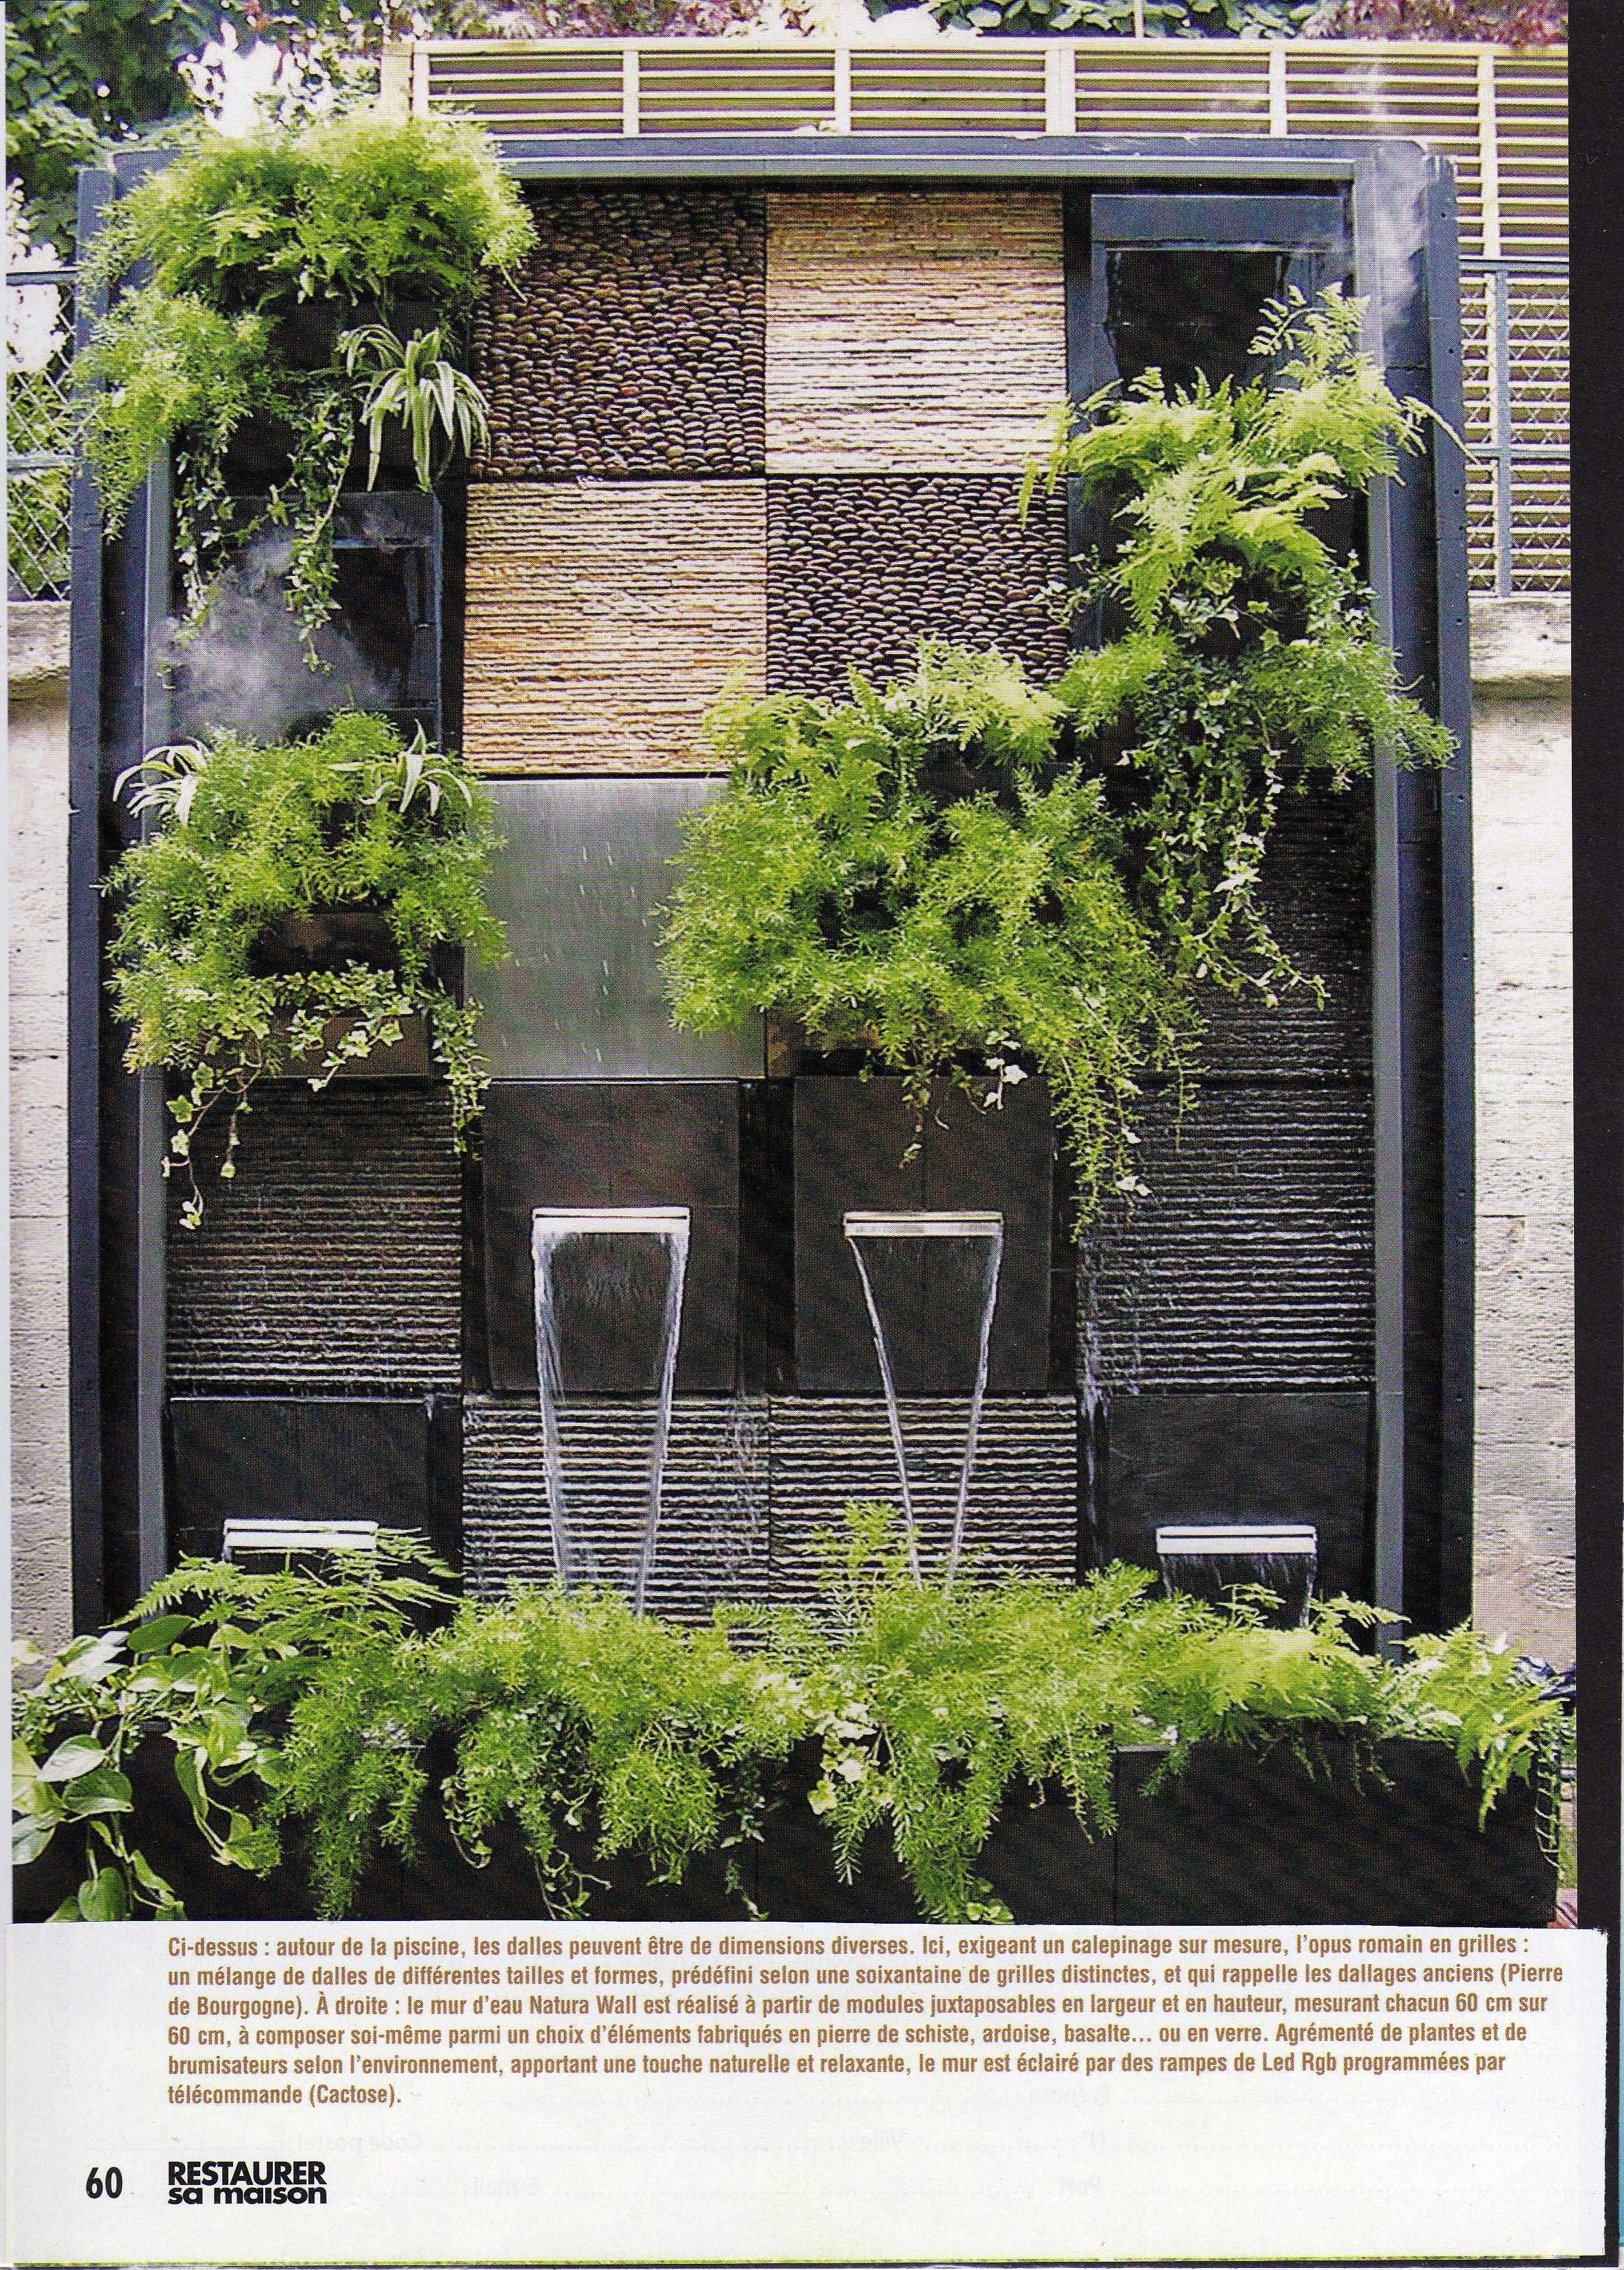 restaurer sa maison cactose pinterest restaurant et maisons. Black Bedroom Furniture Sets. Home Design Ideas